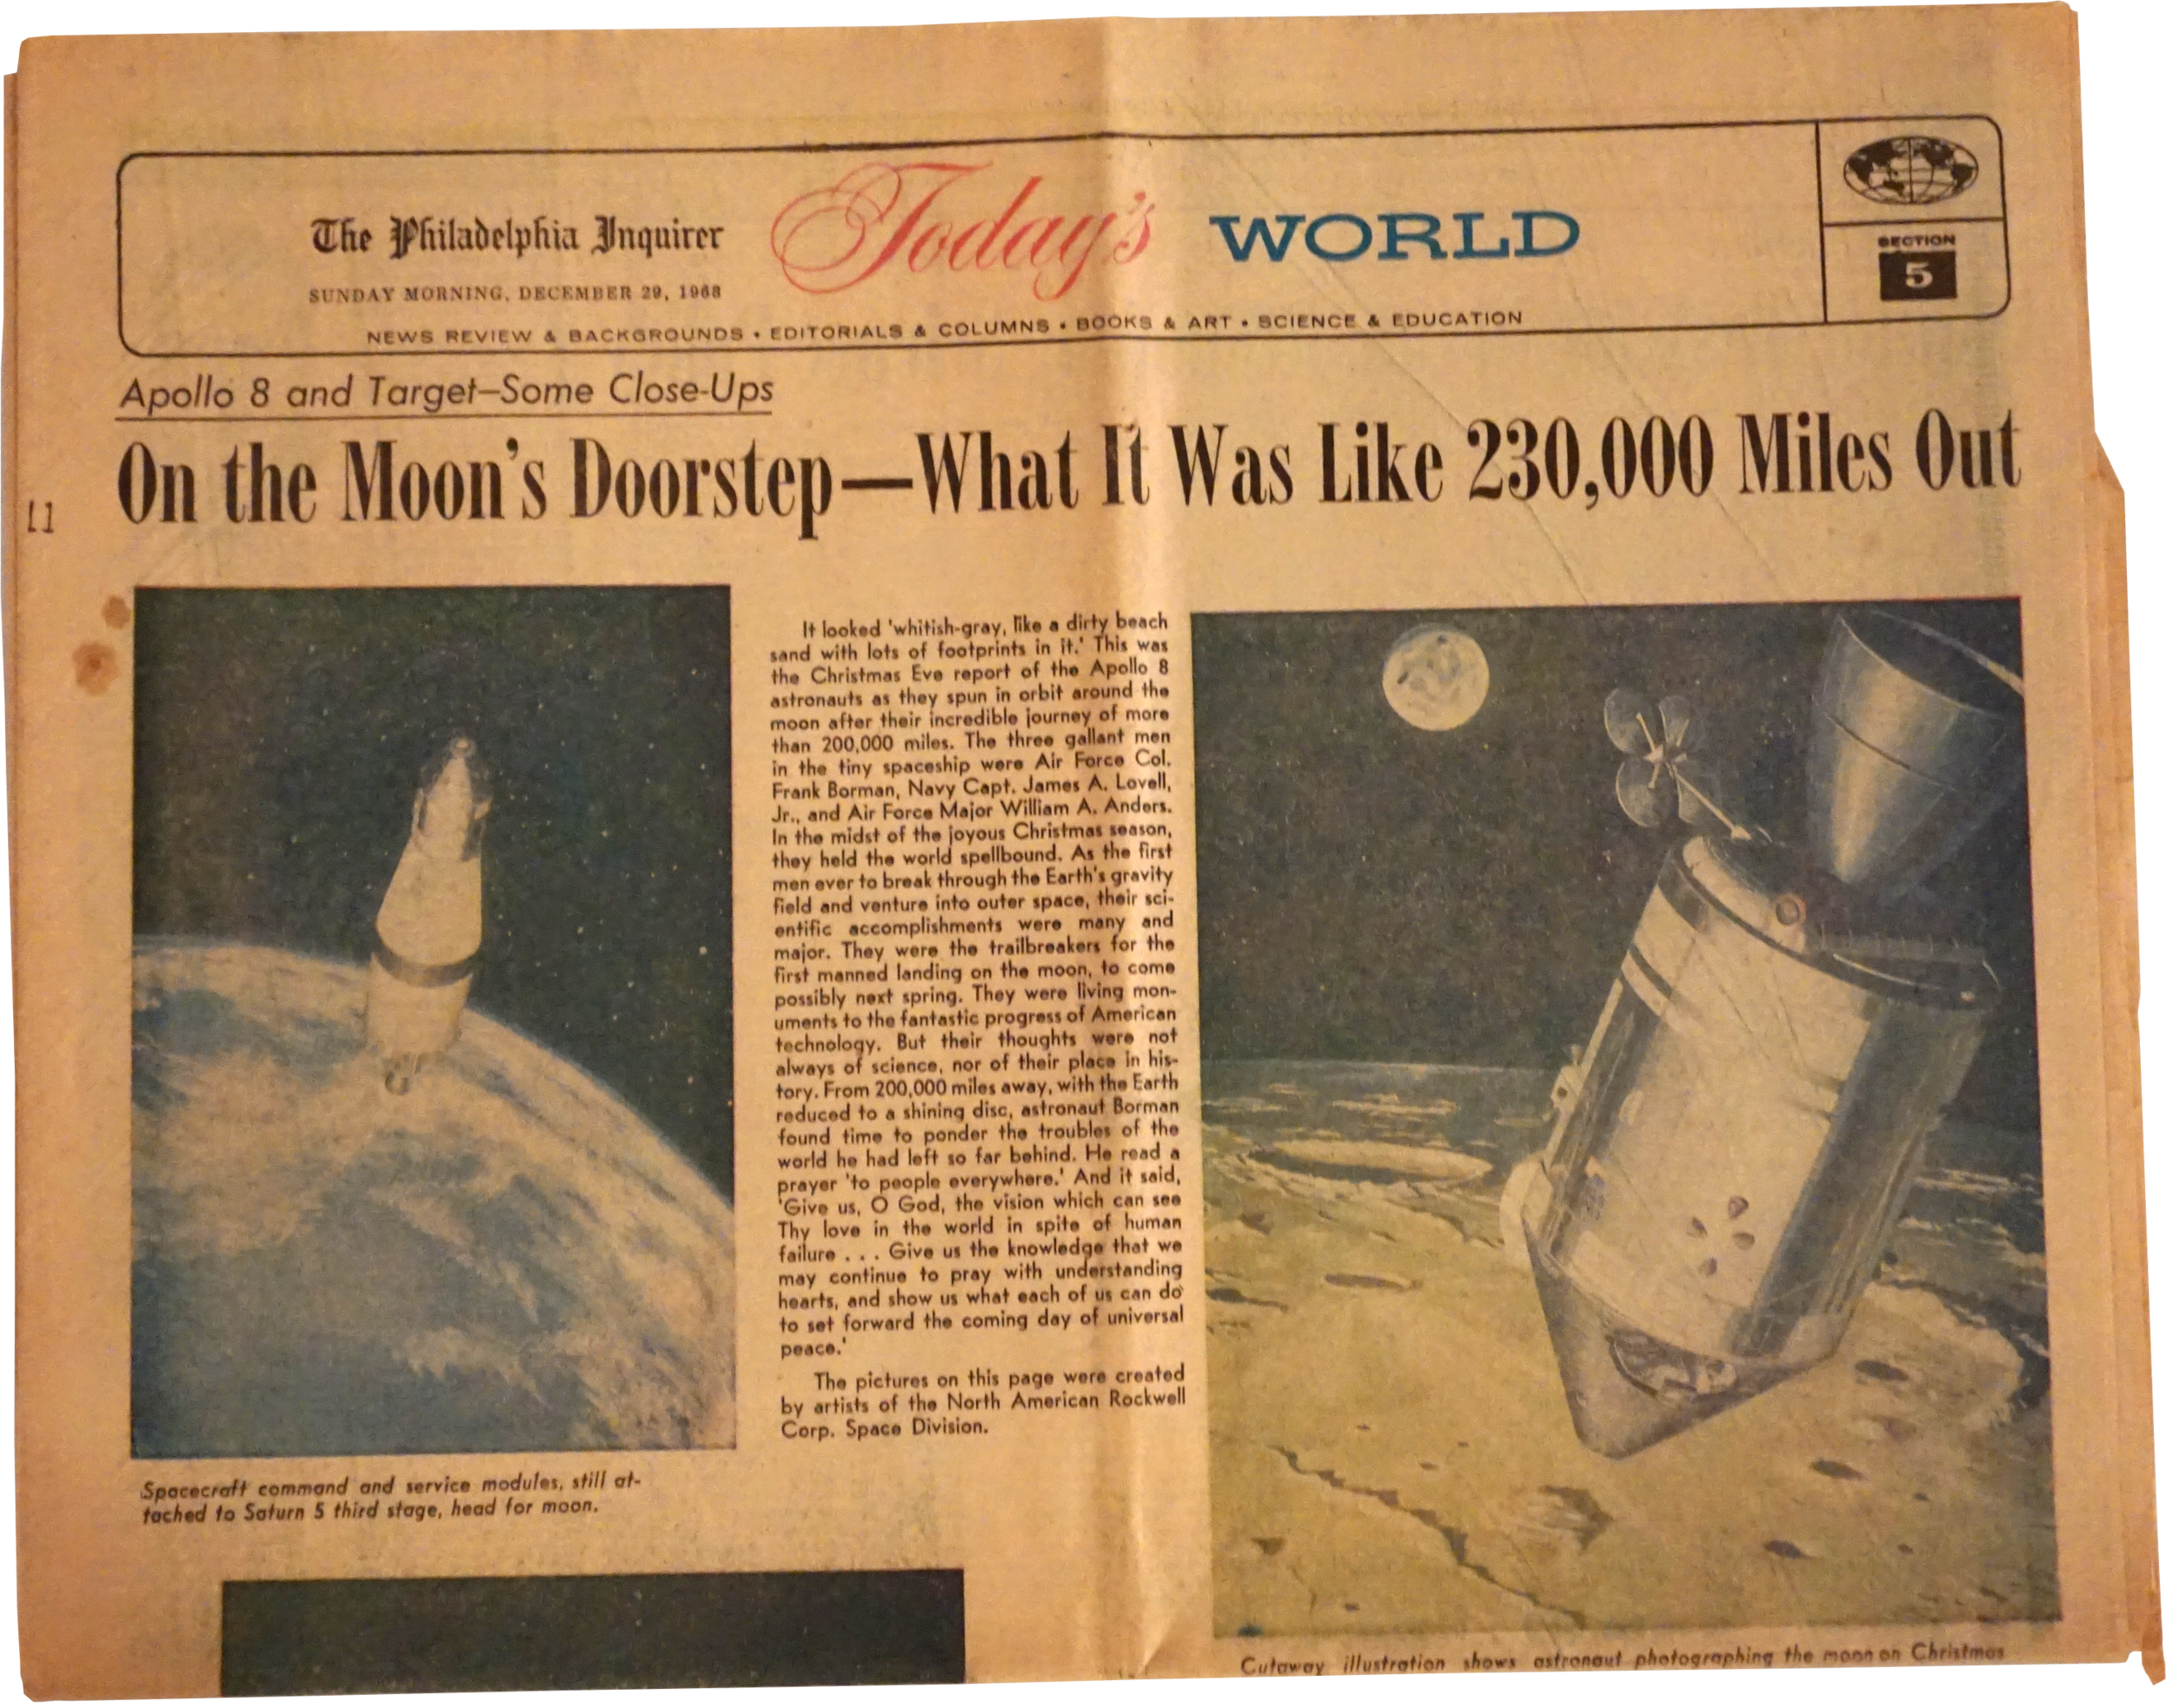 ERM-1968-NEWSPAPER-PHILADELPHIA_INQUIERER-122968.png